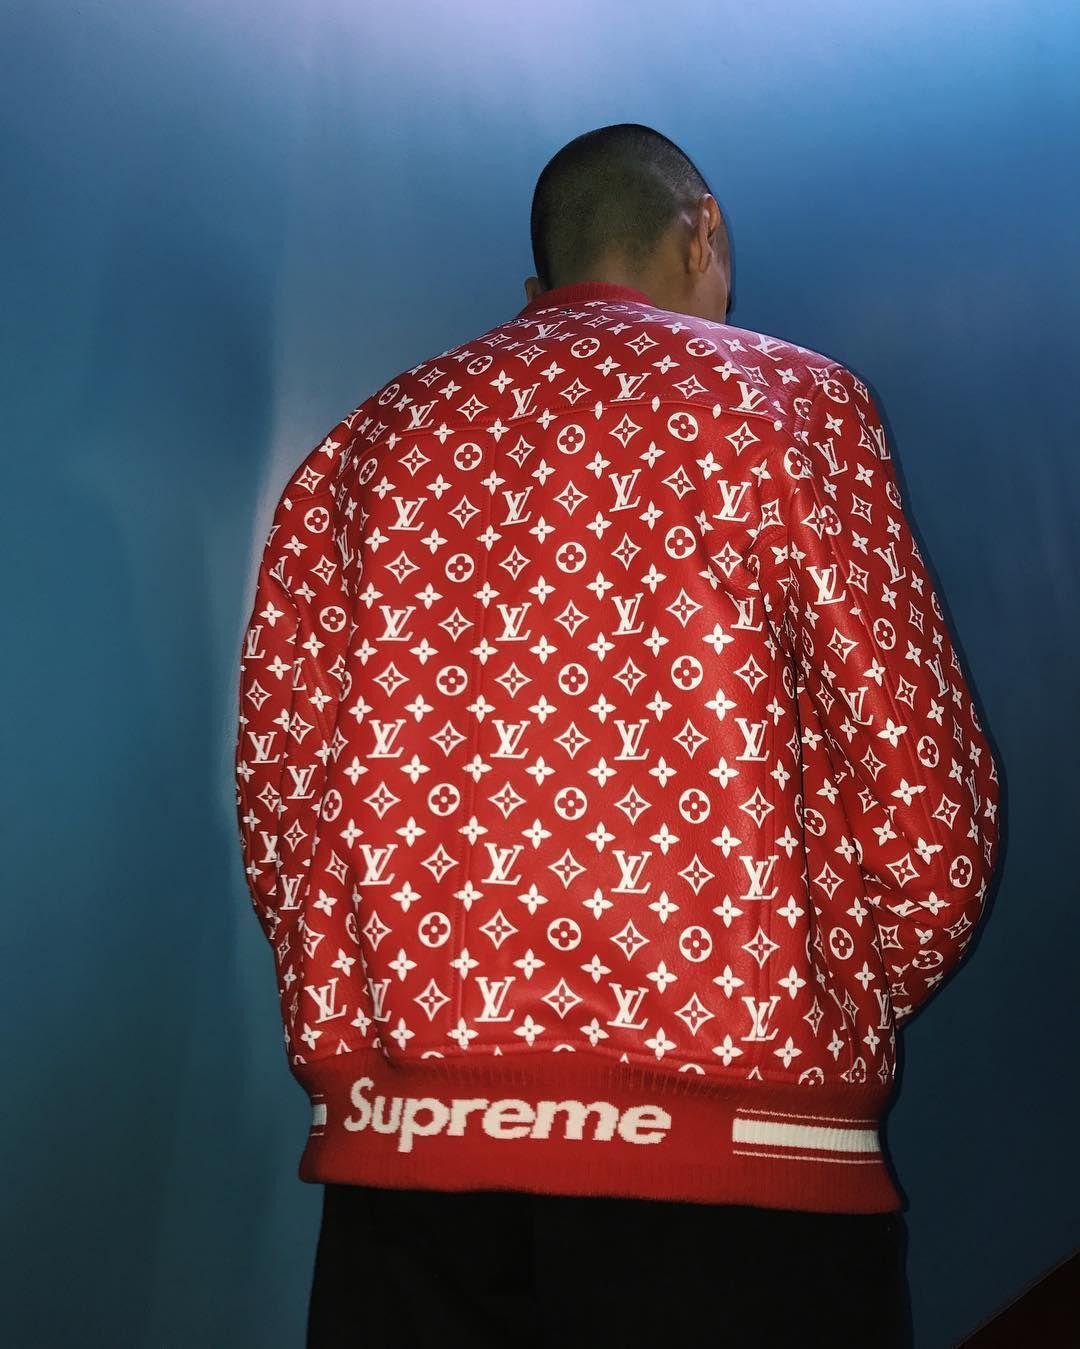 58f053ba9c67 Supreme x Louis Vuitton Is Real...